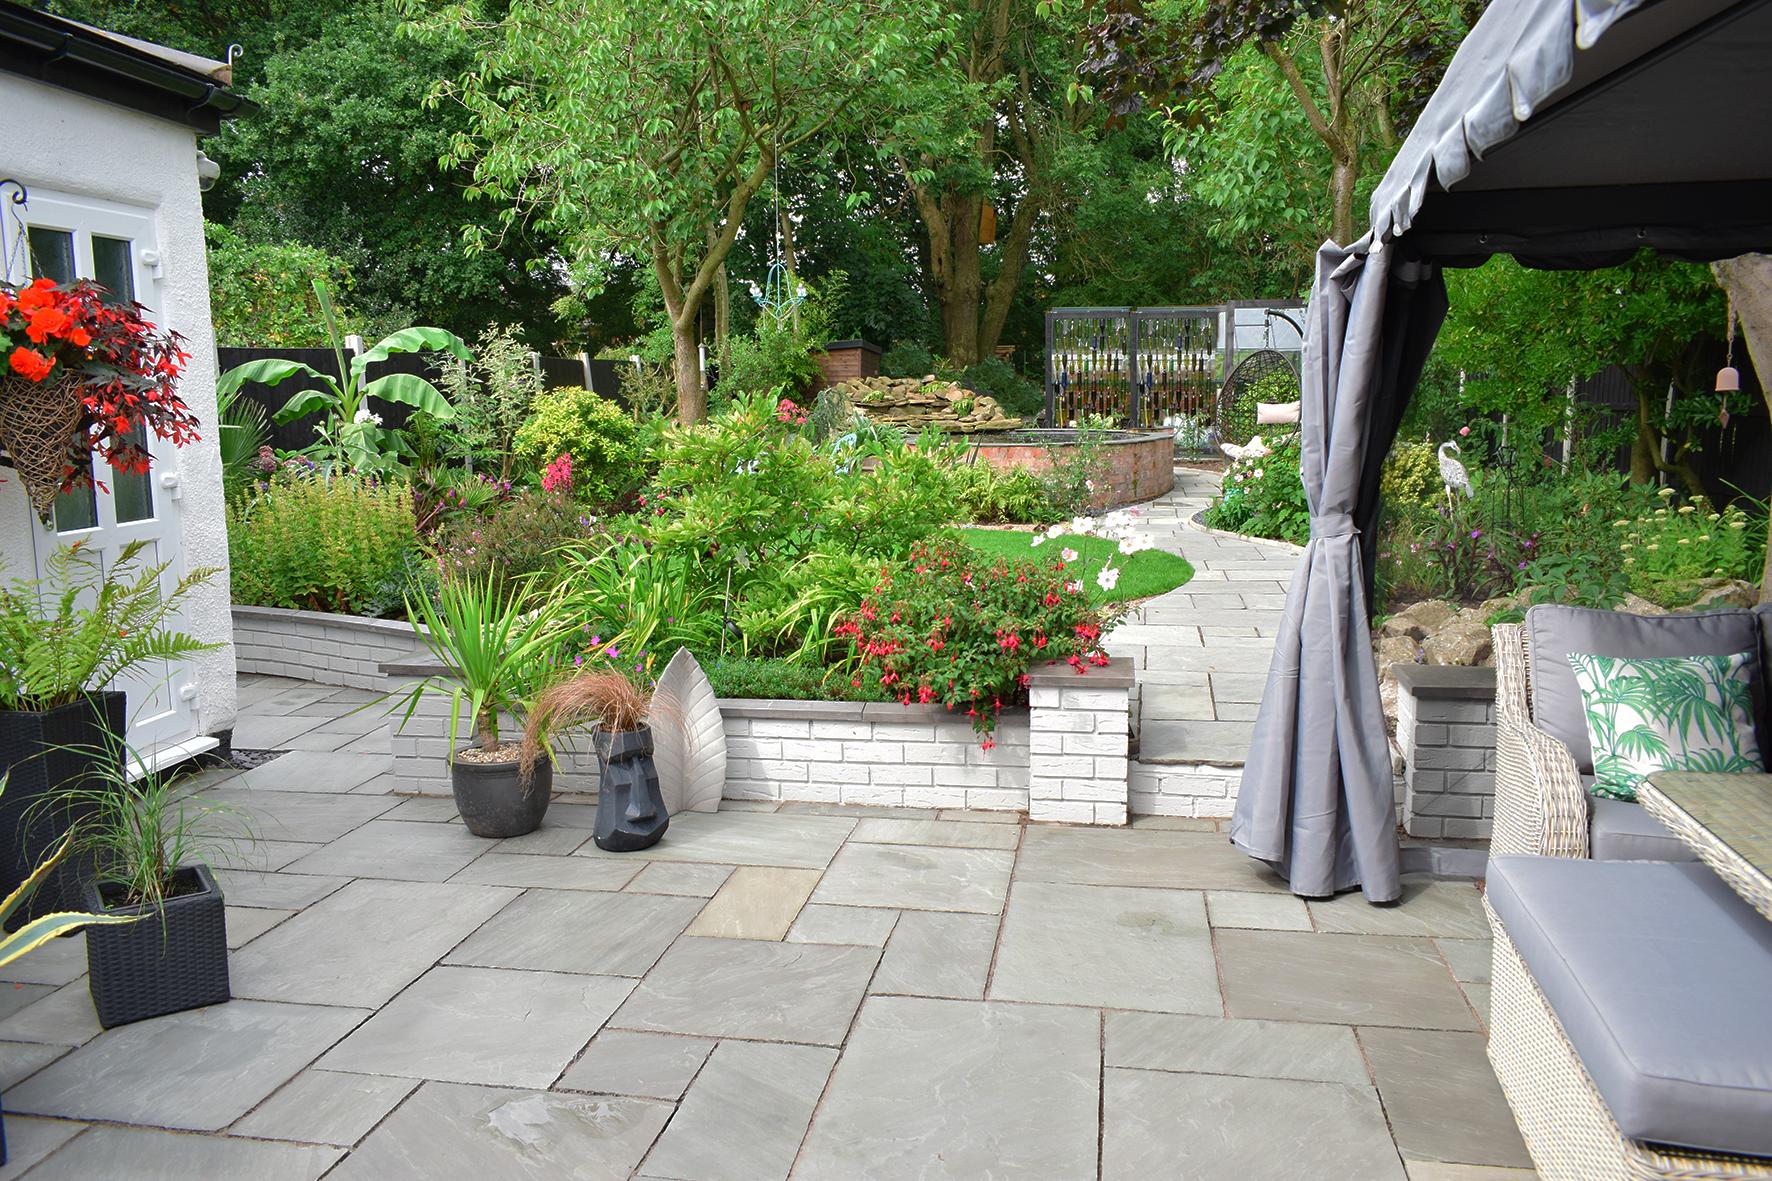 Garden Patio After